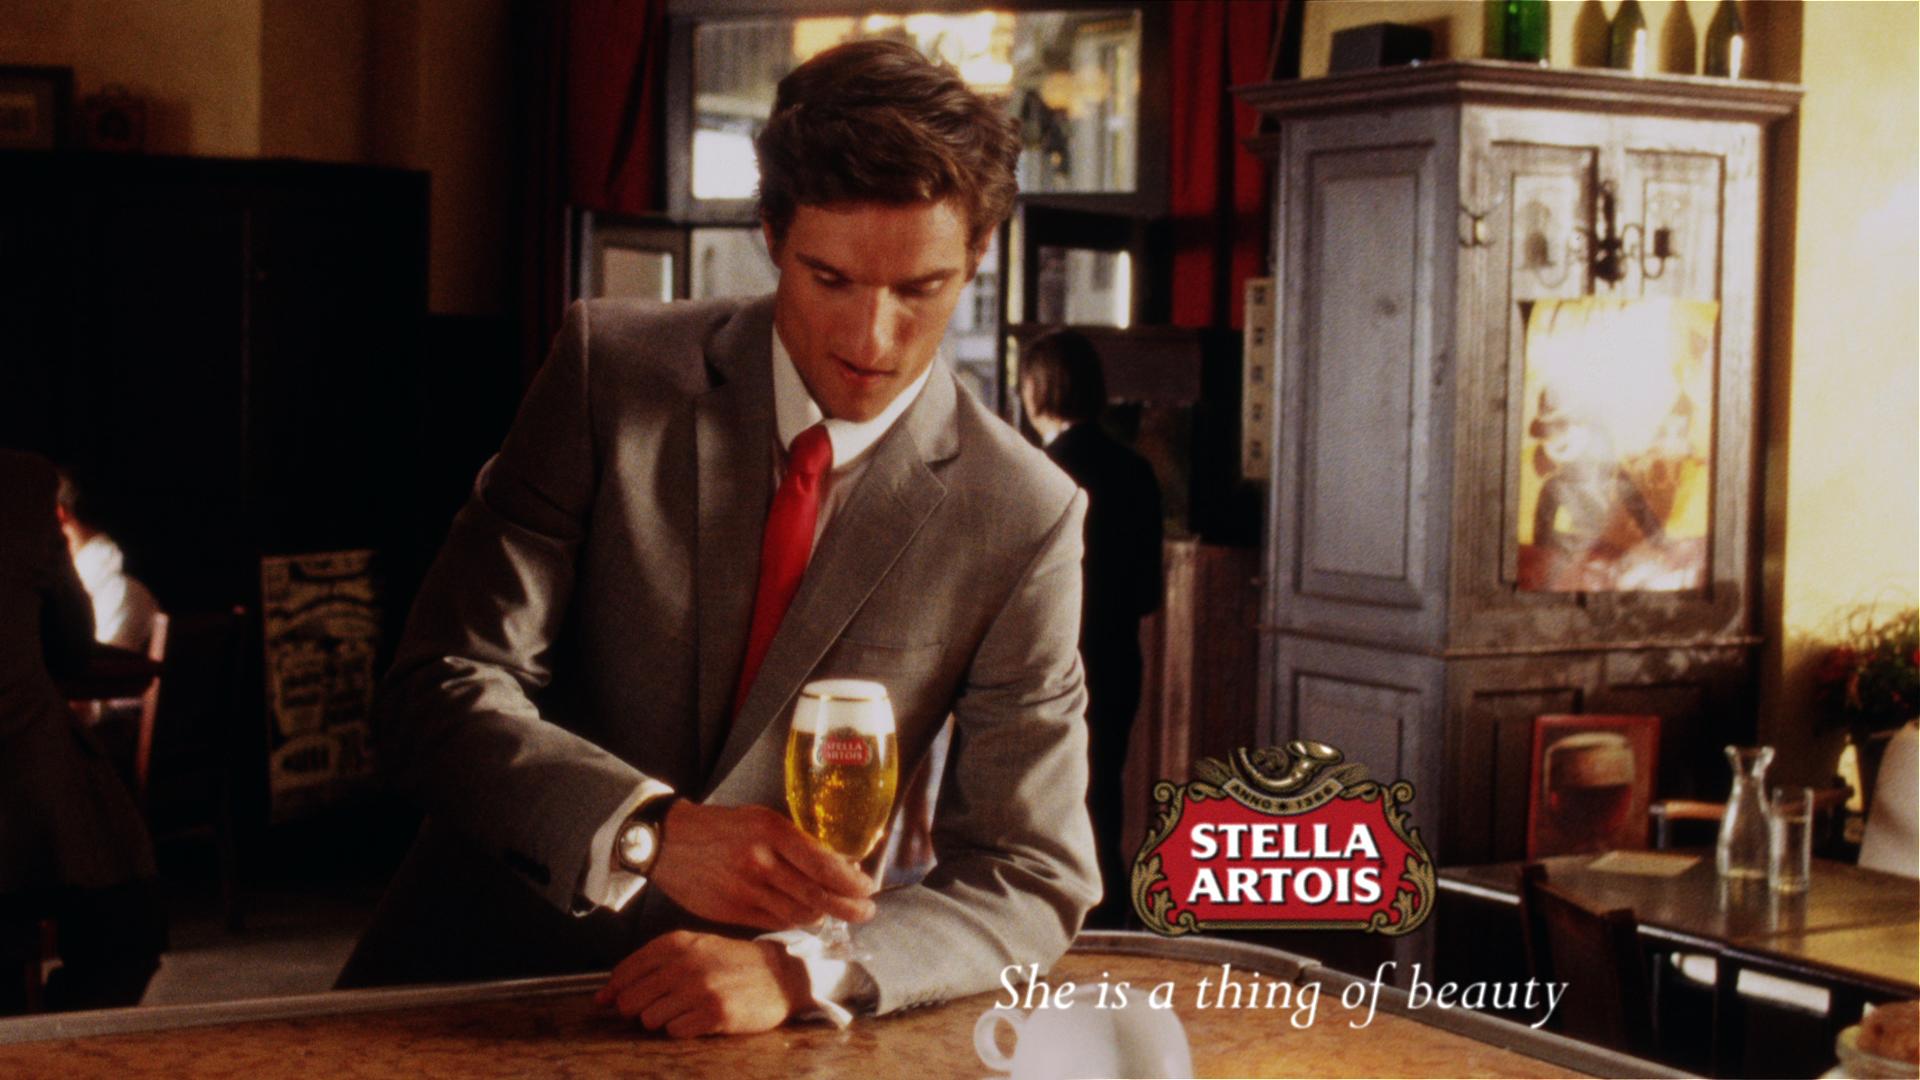 Stella artois ad 2013